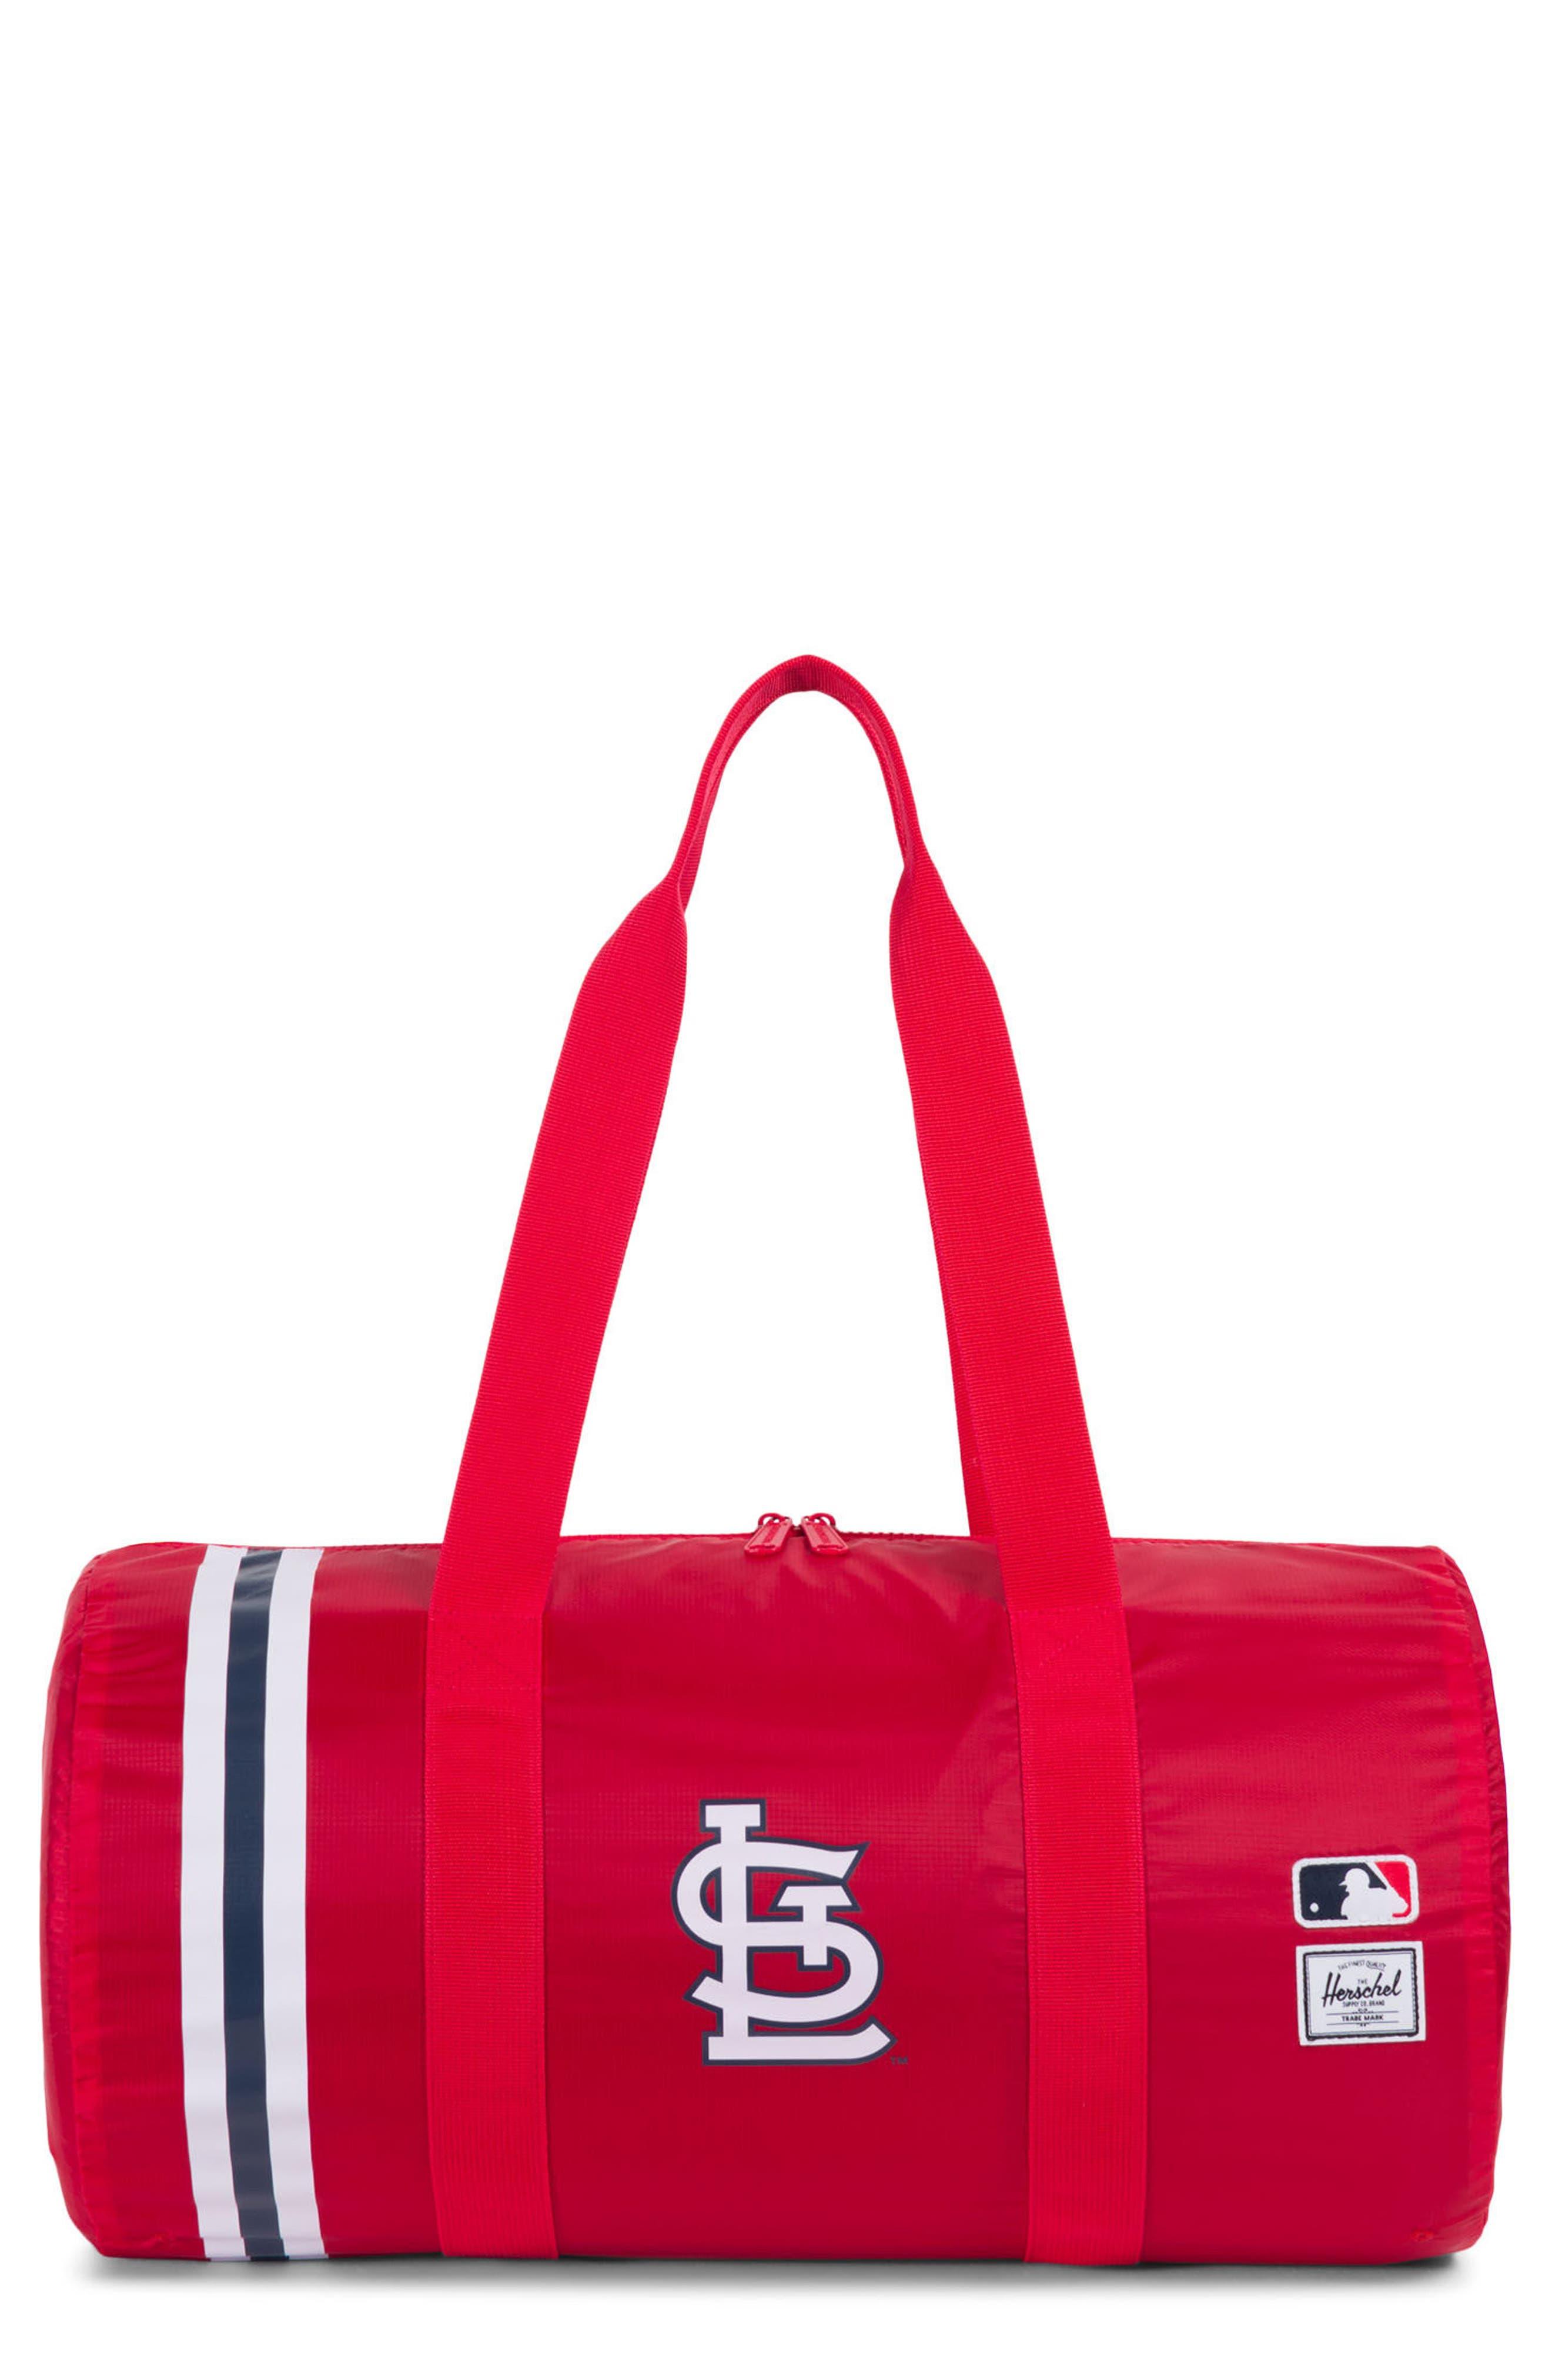 52bd3efa9fab Herschel Supply Co. Packable - Mlb National League Duffel Bag - Red In St  Louis